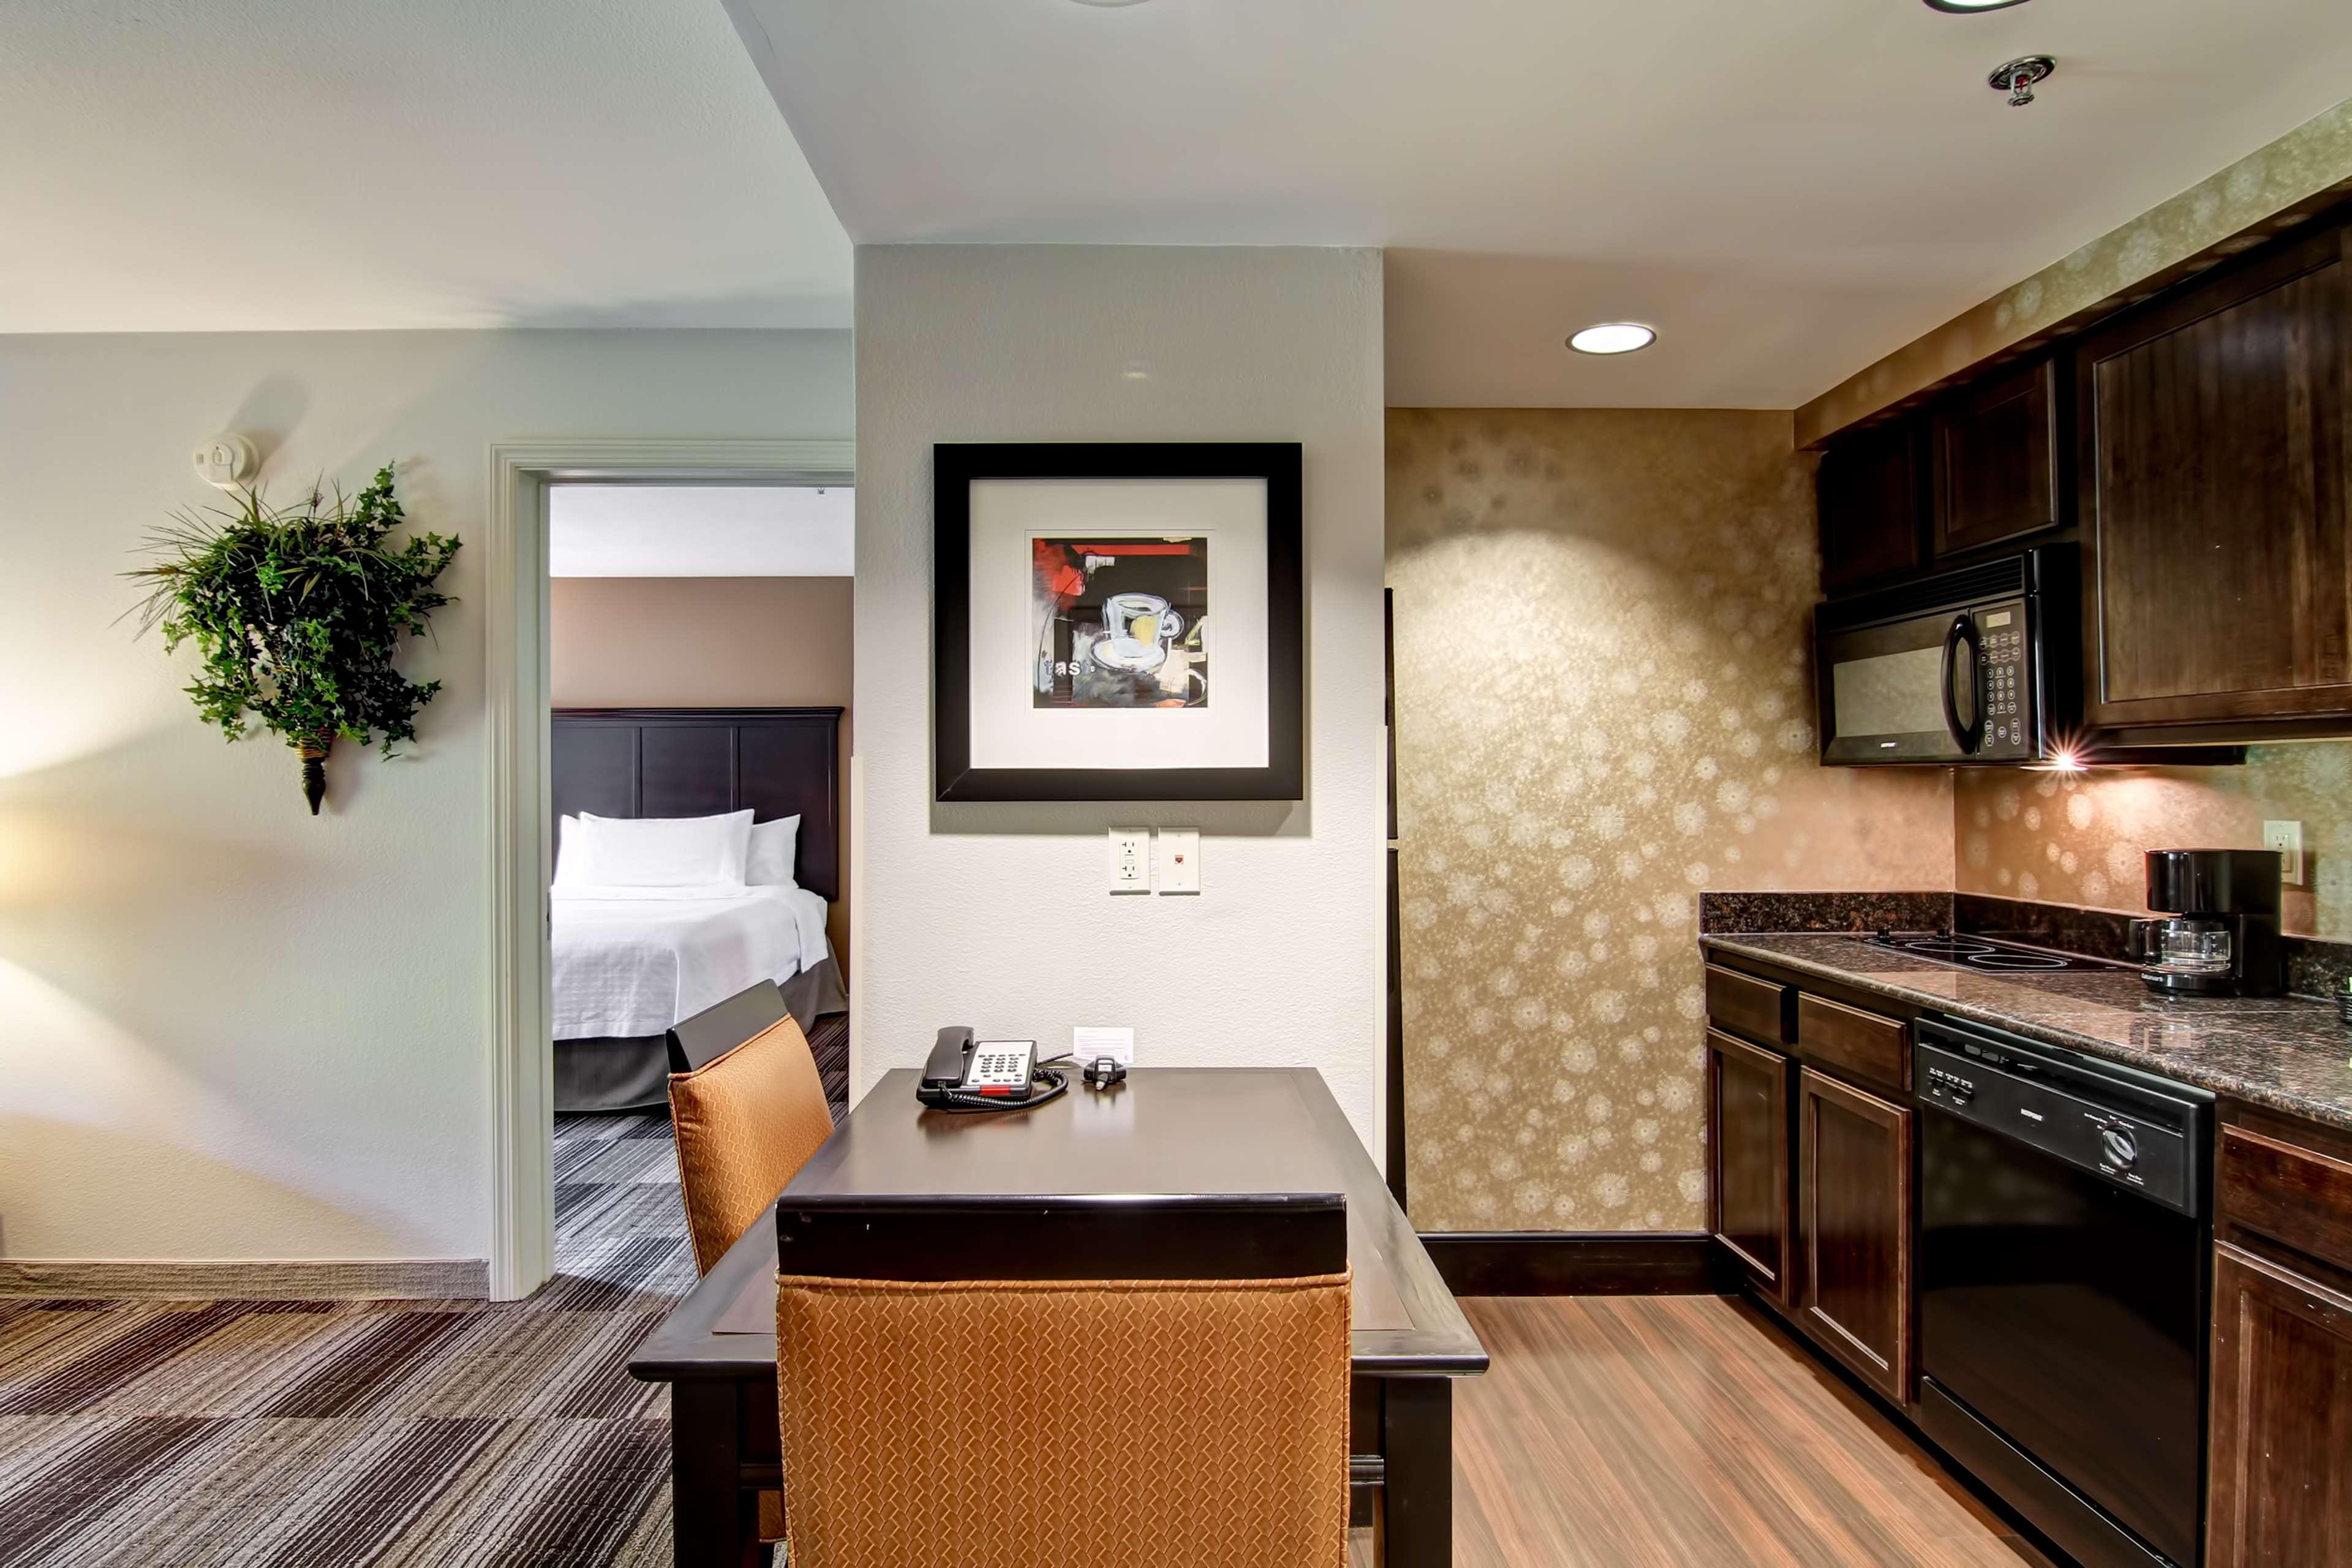 Homewood Suites by Hilton Cincinnati Airport South-Florence image 18